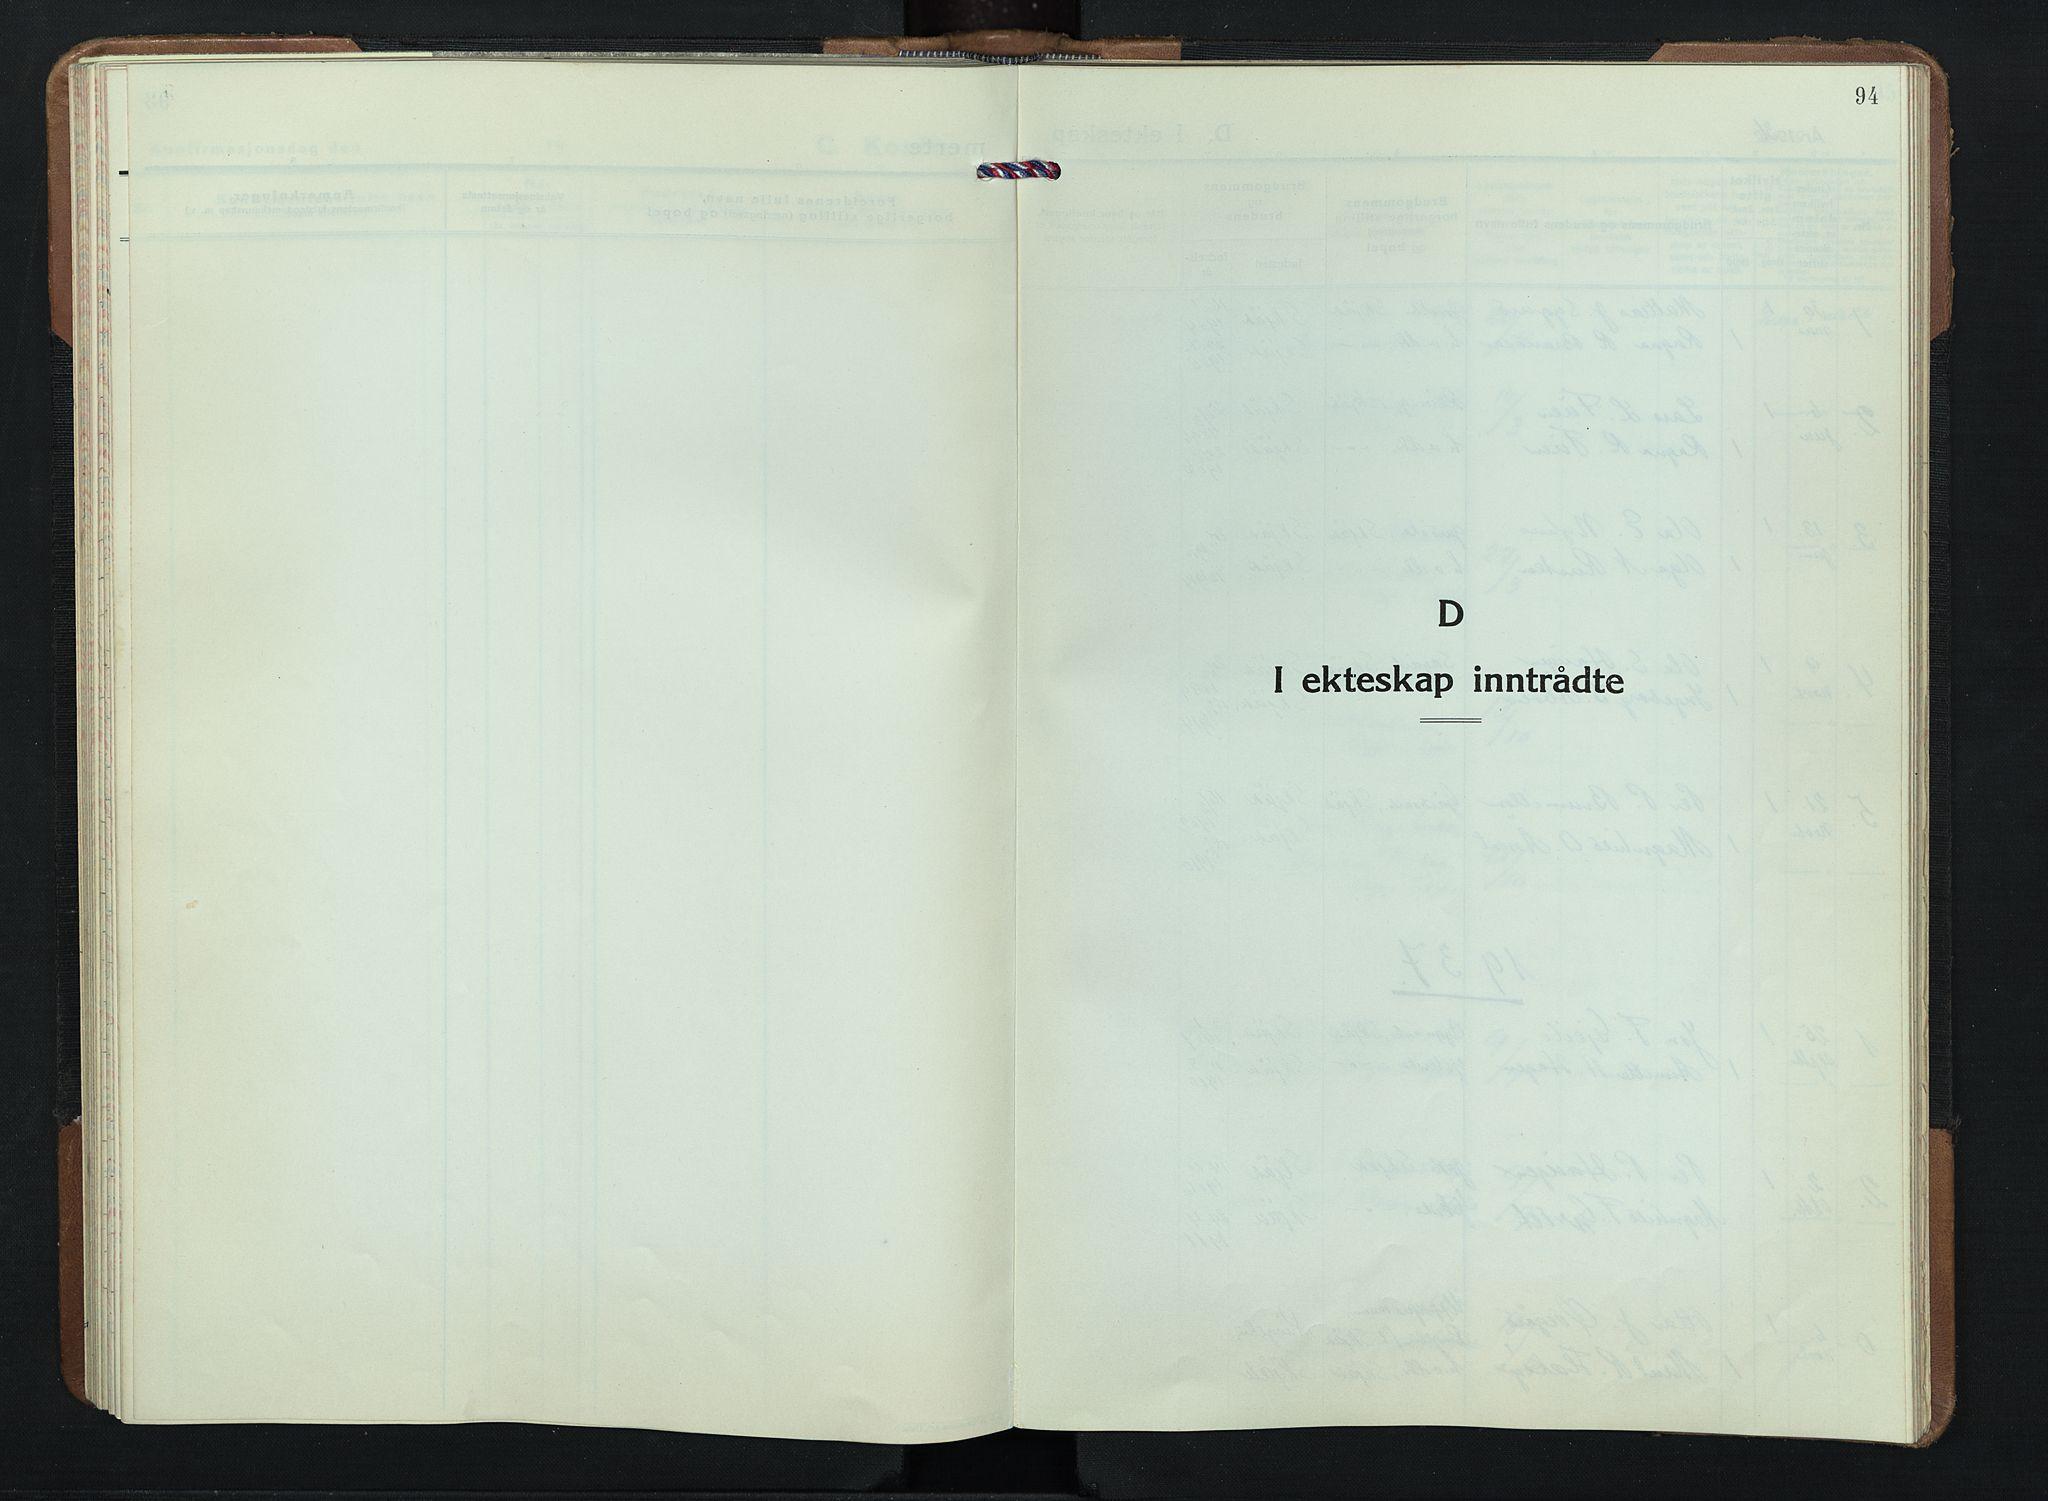 SAH, Skjåk prestekontor, Klokkerbok nr. 7, 1936-1958, s. 94